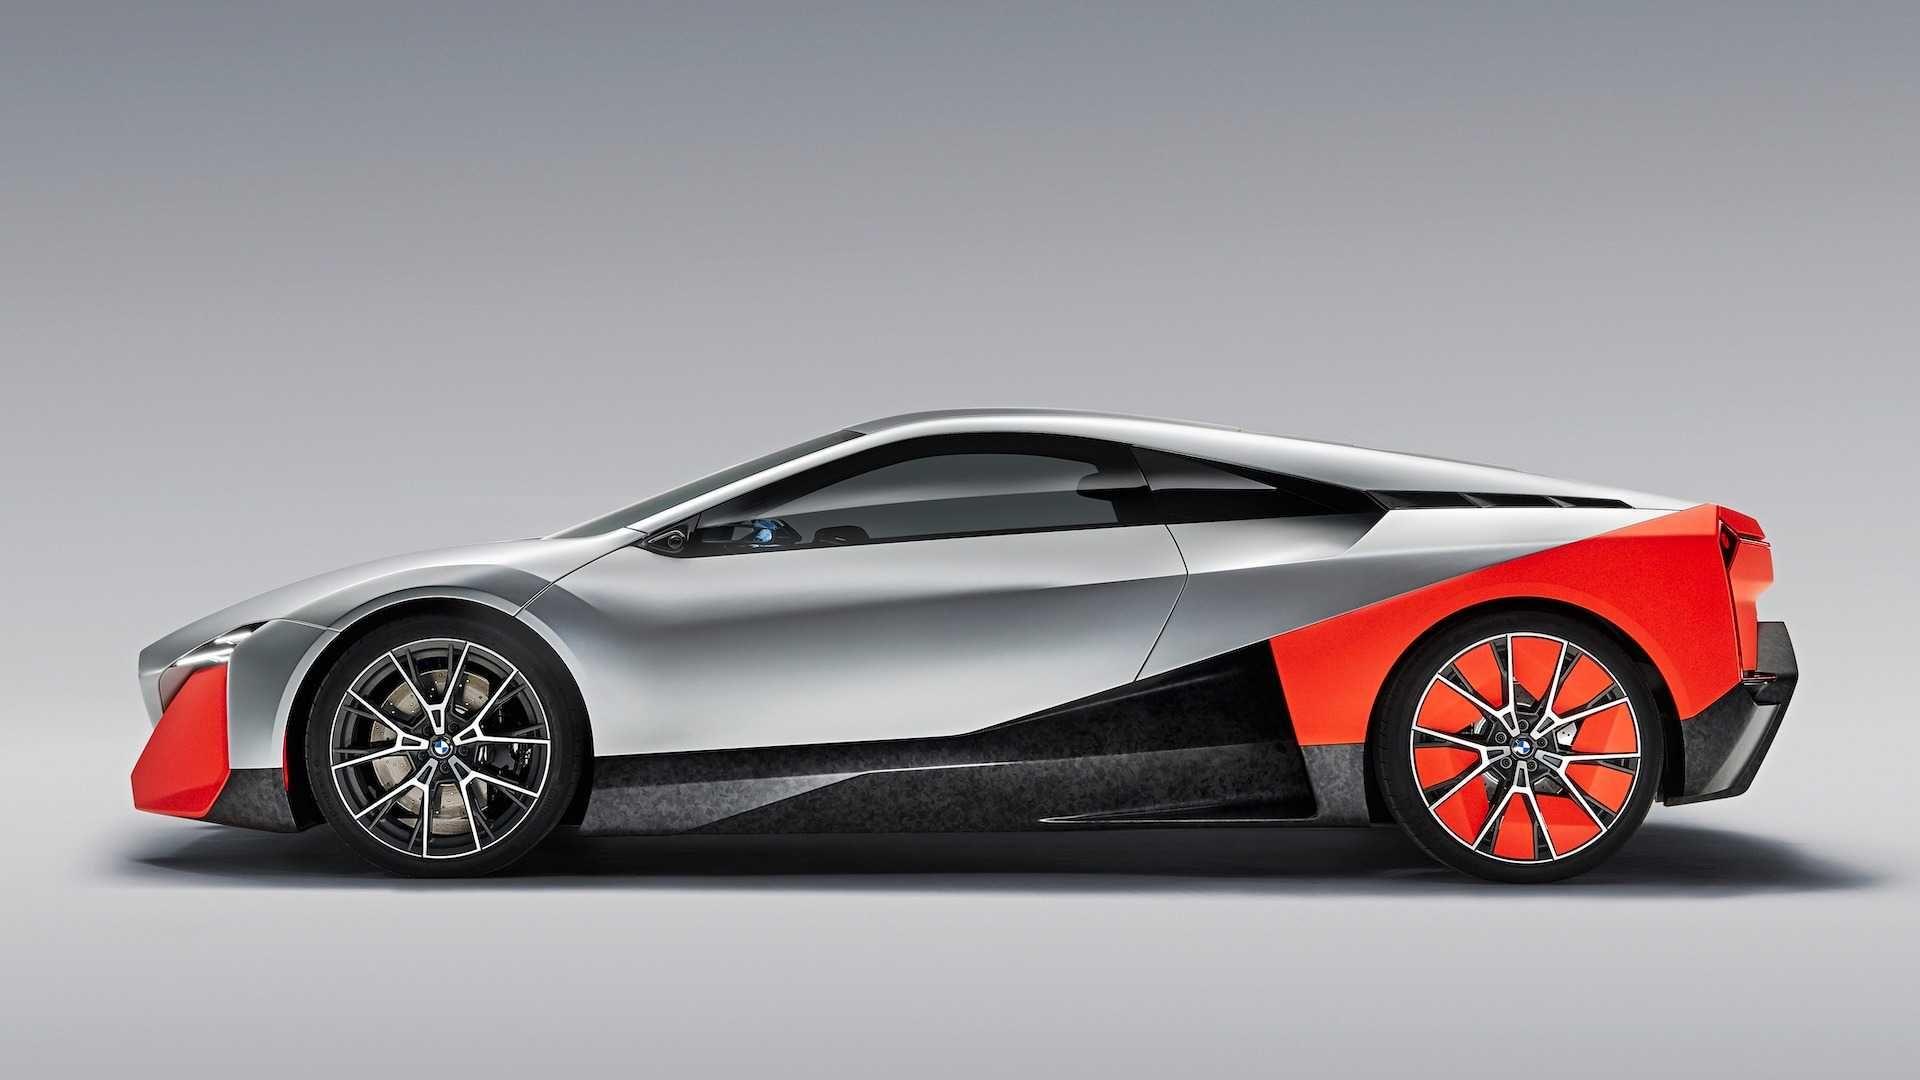 Bmw Vision M Concept Is A Stunning And Futuristic M1 Bmw Bmw Concept Car Hybrid Sports Car